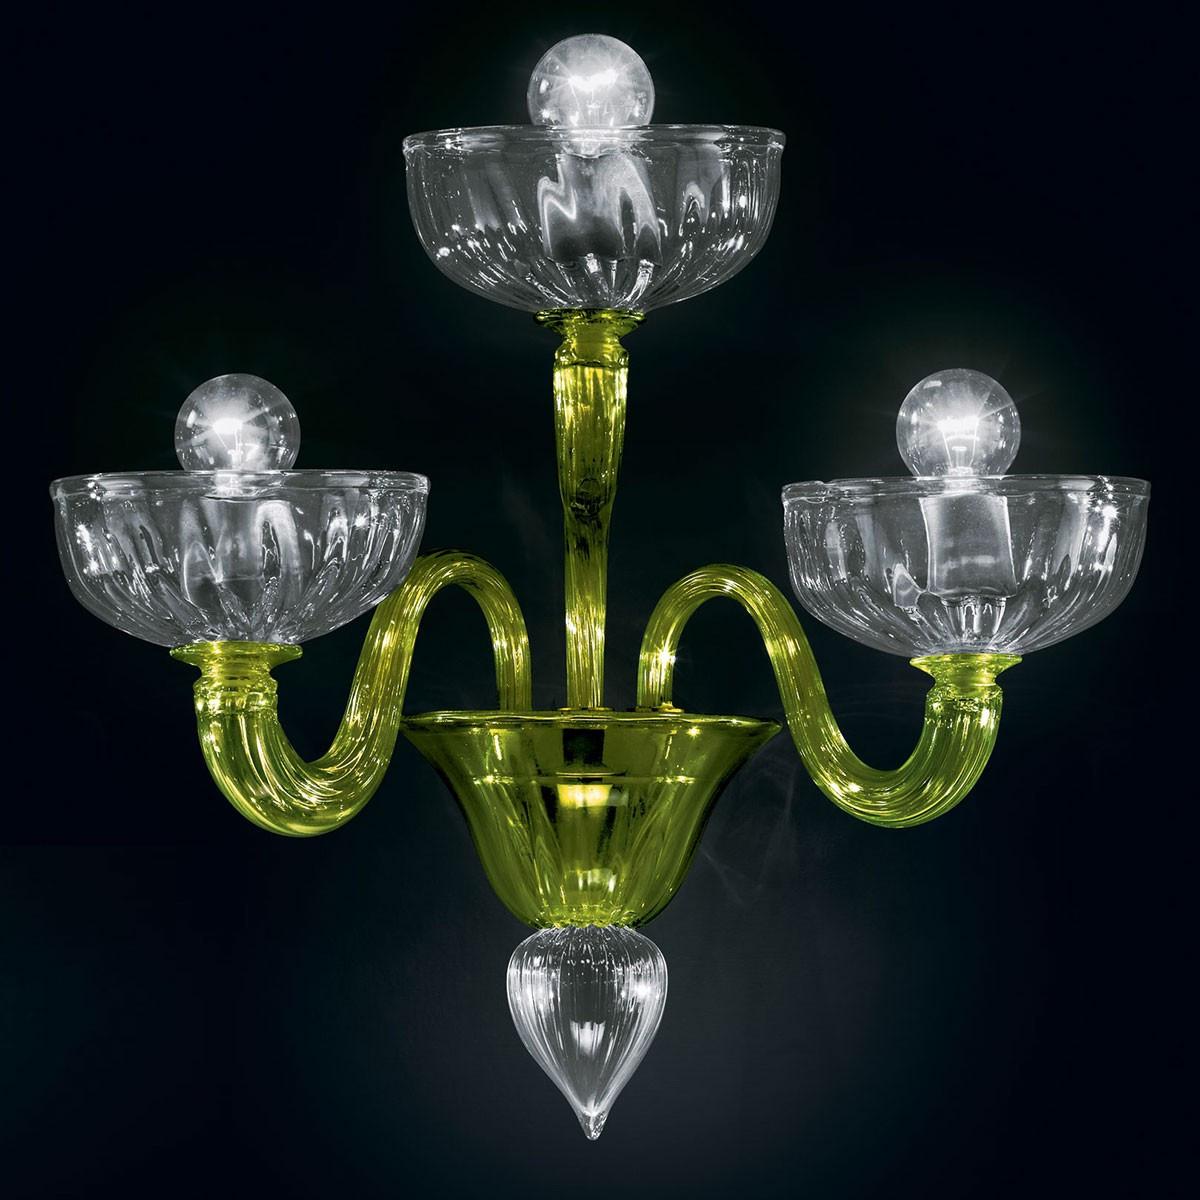 """Andronico"" aplique de pared de Murano - 3 luces - verde y transparente"